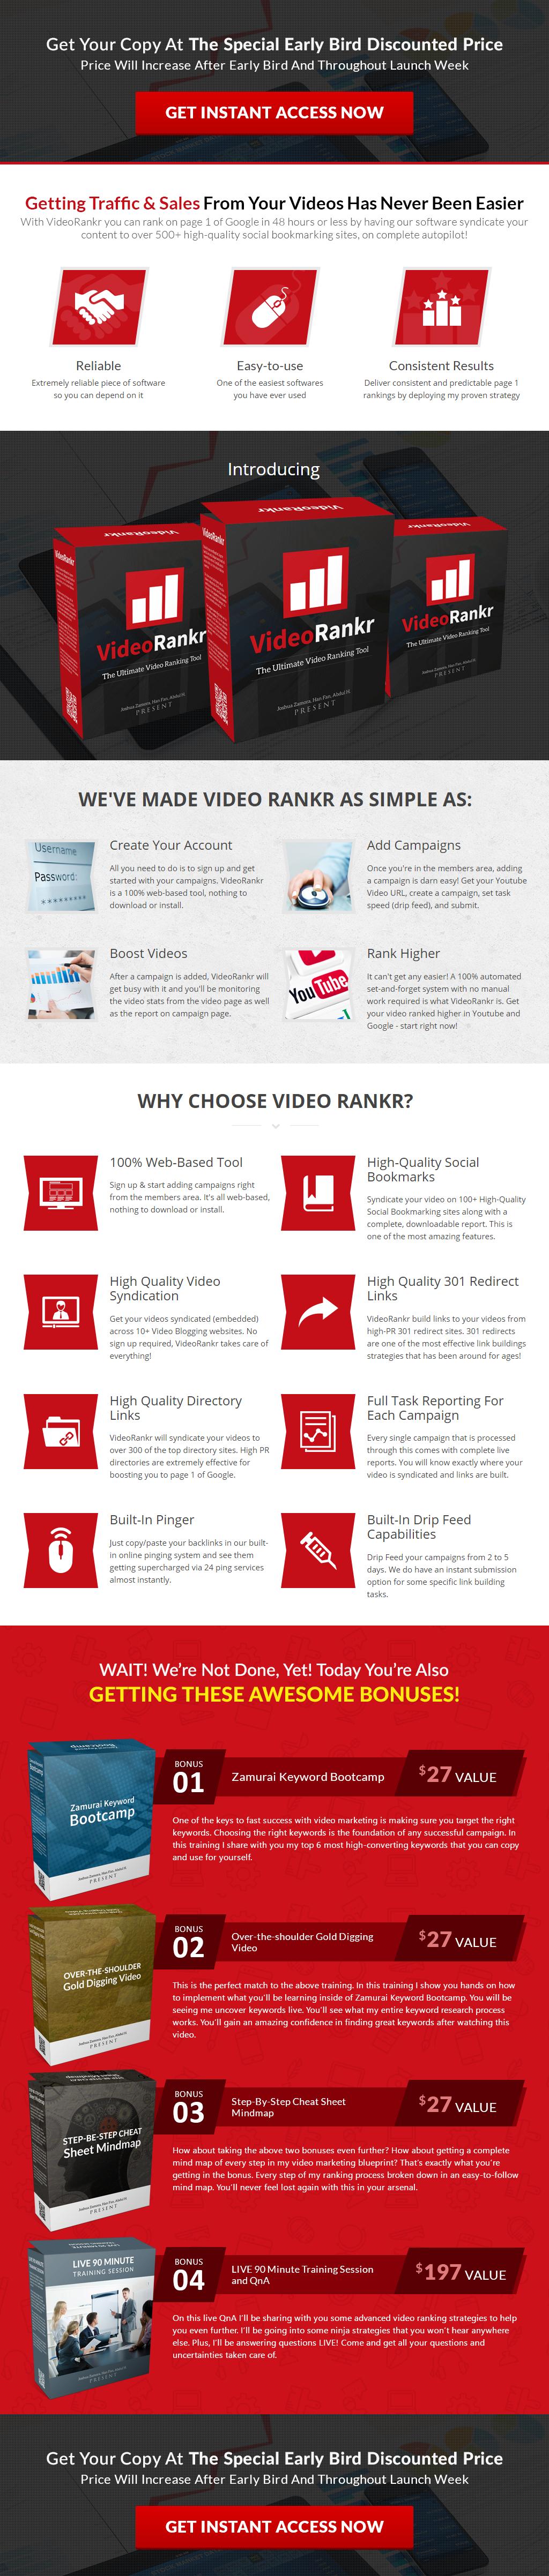 videorankr bonus